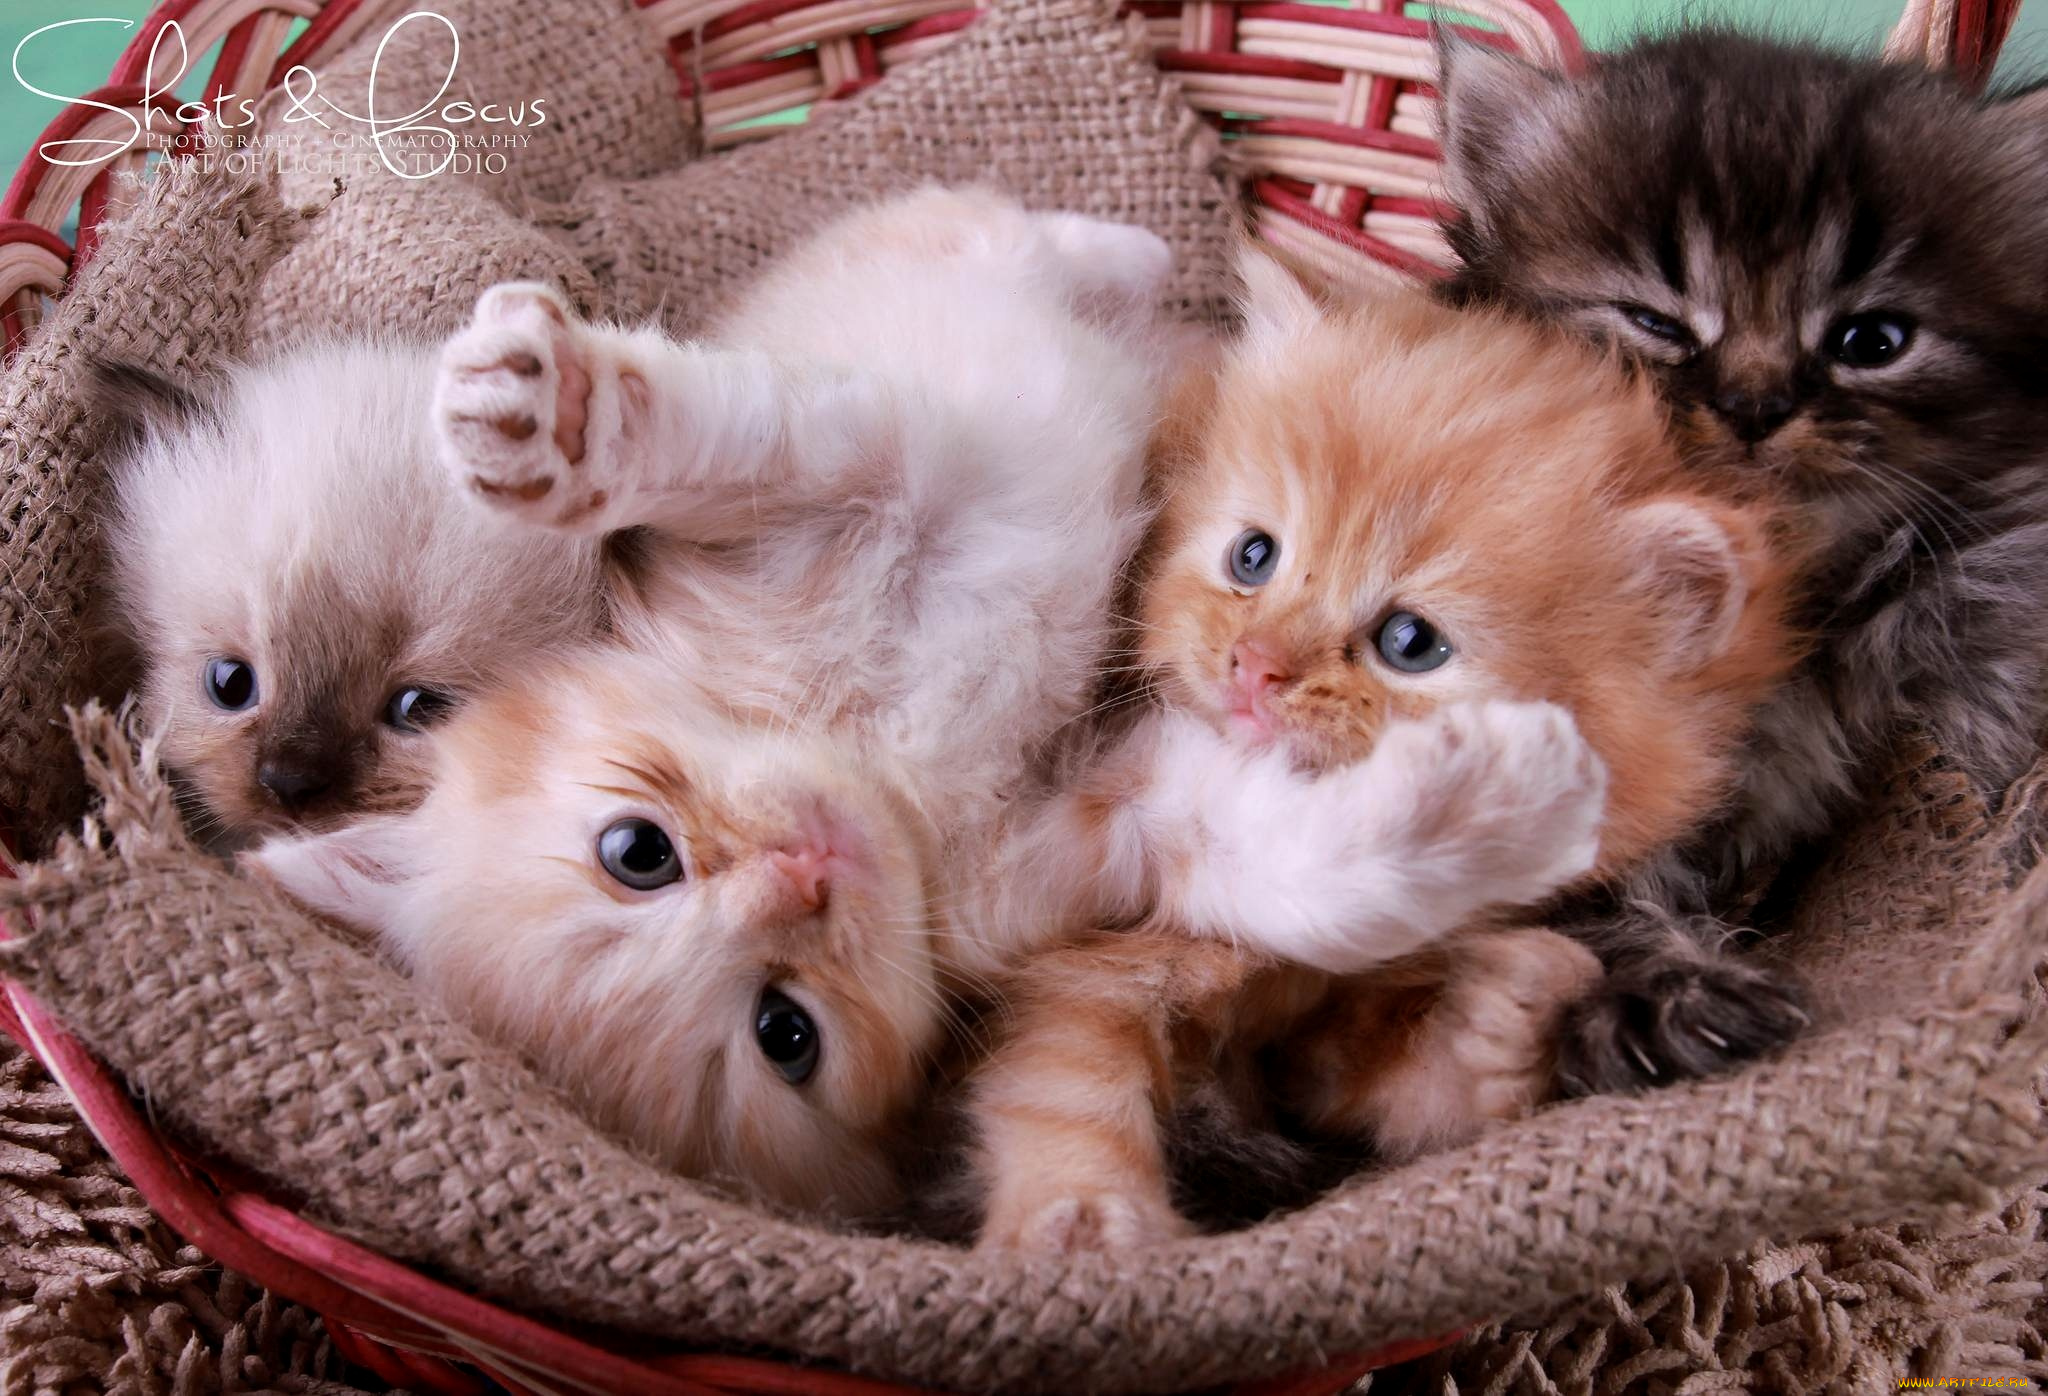 него характерно картинки котят красивого формата характеристик